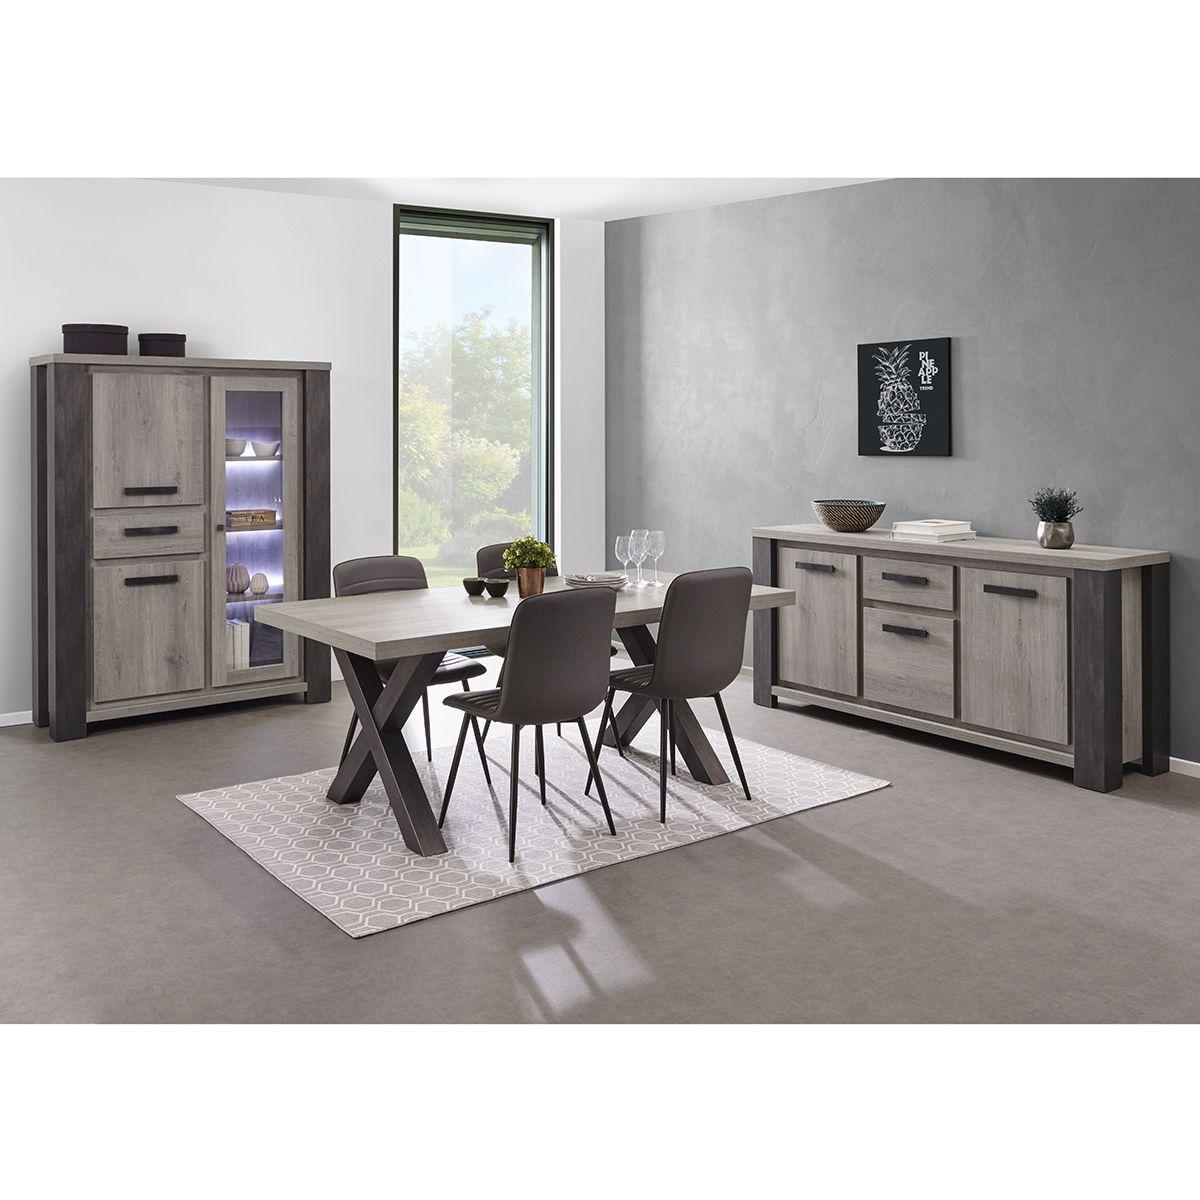 Table Rectangulaire 160cm